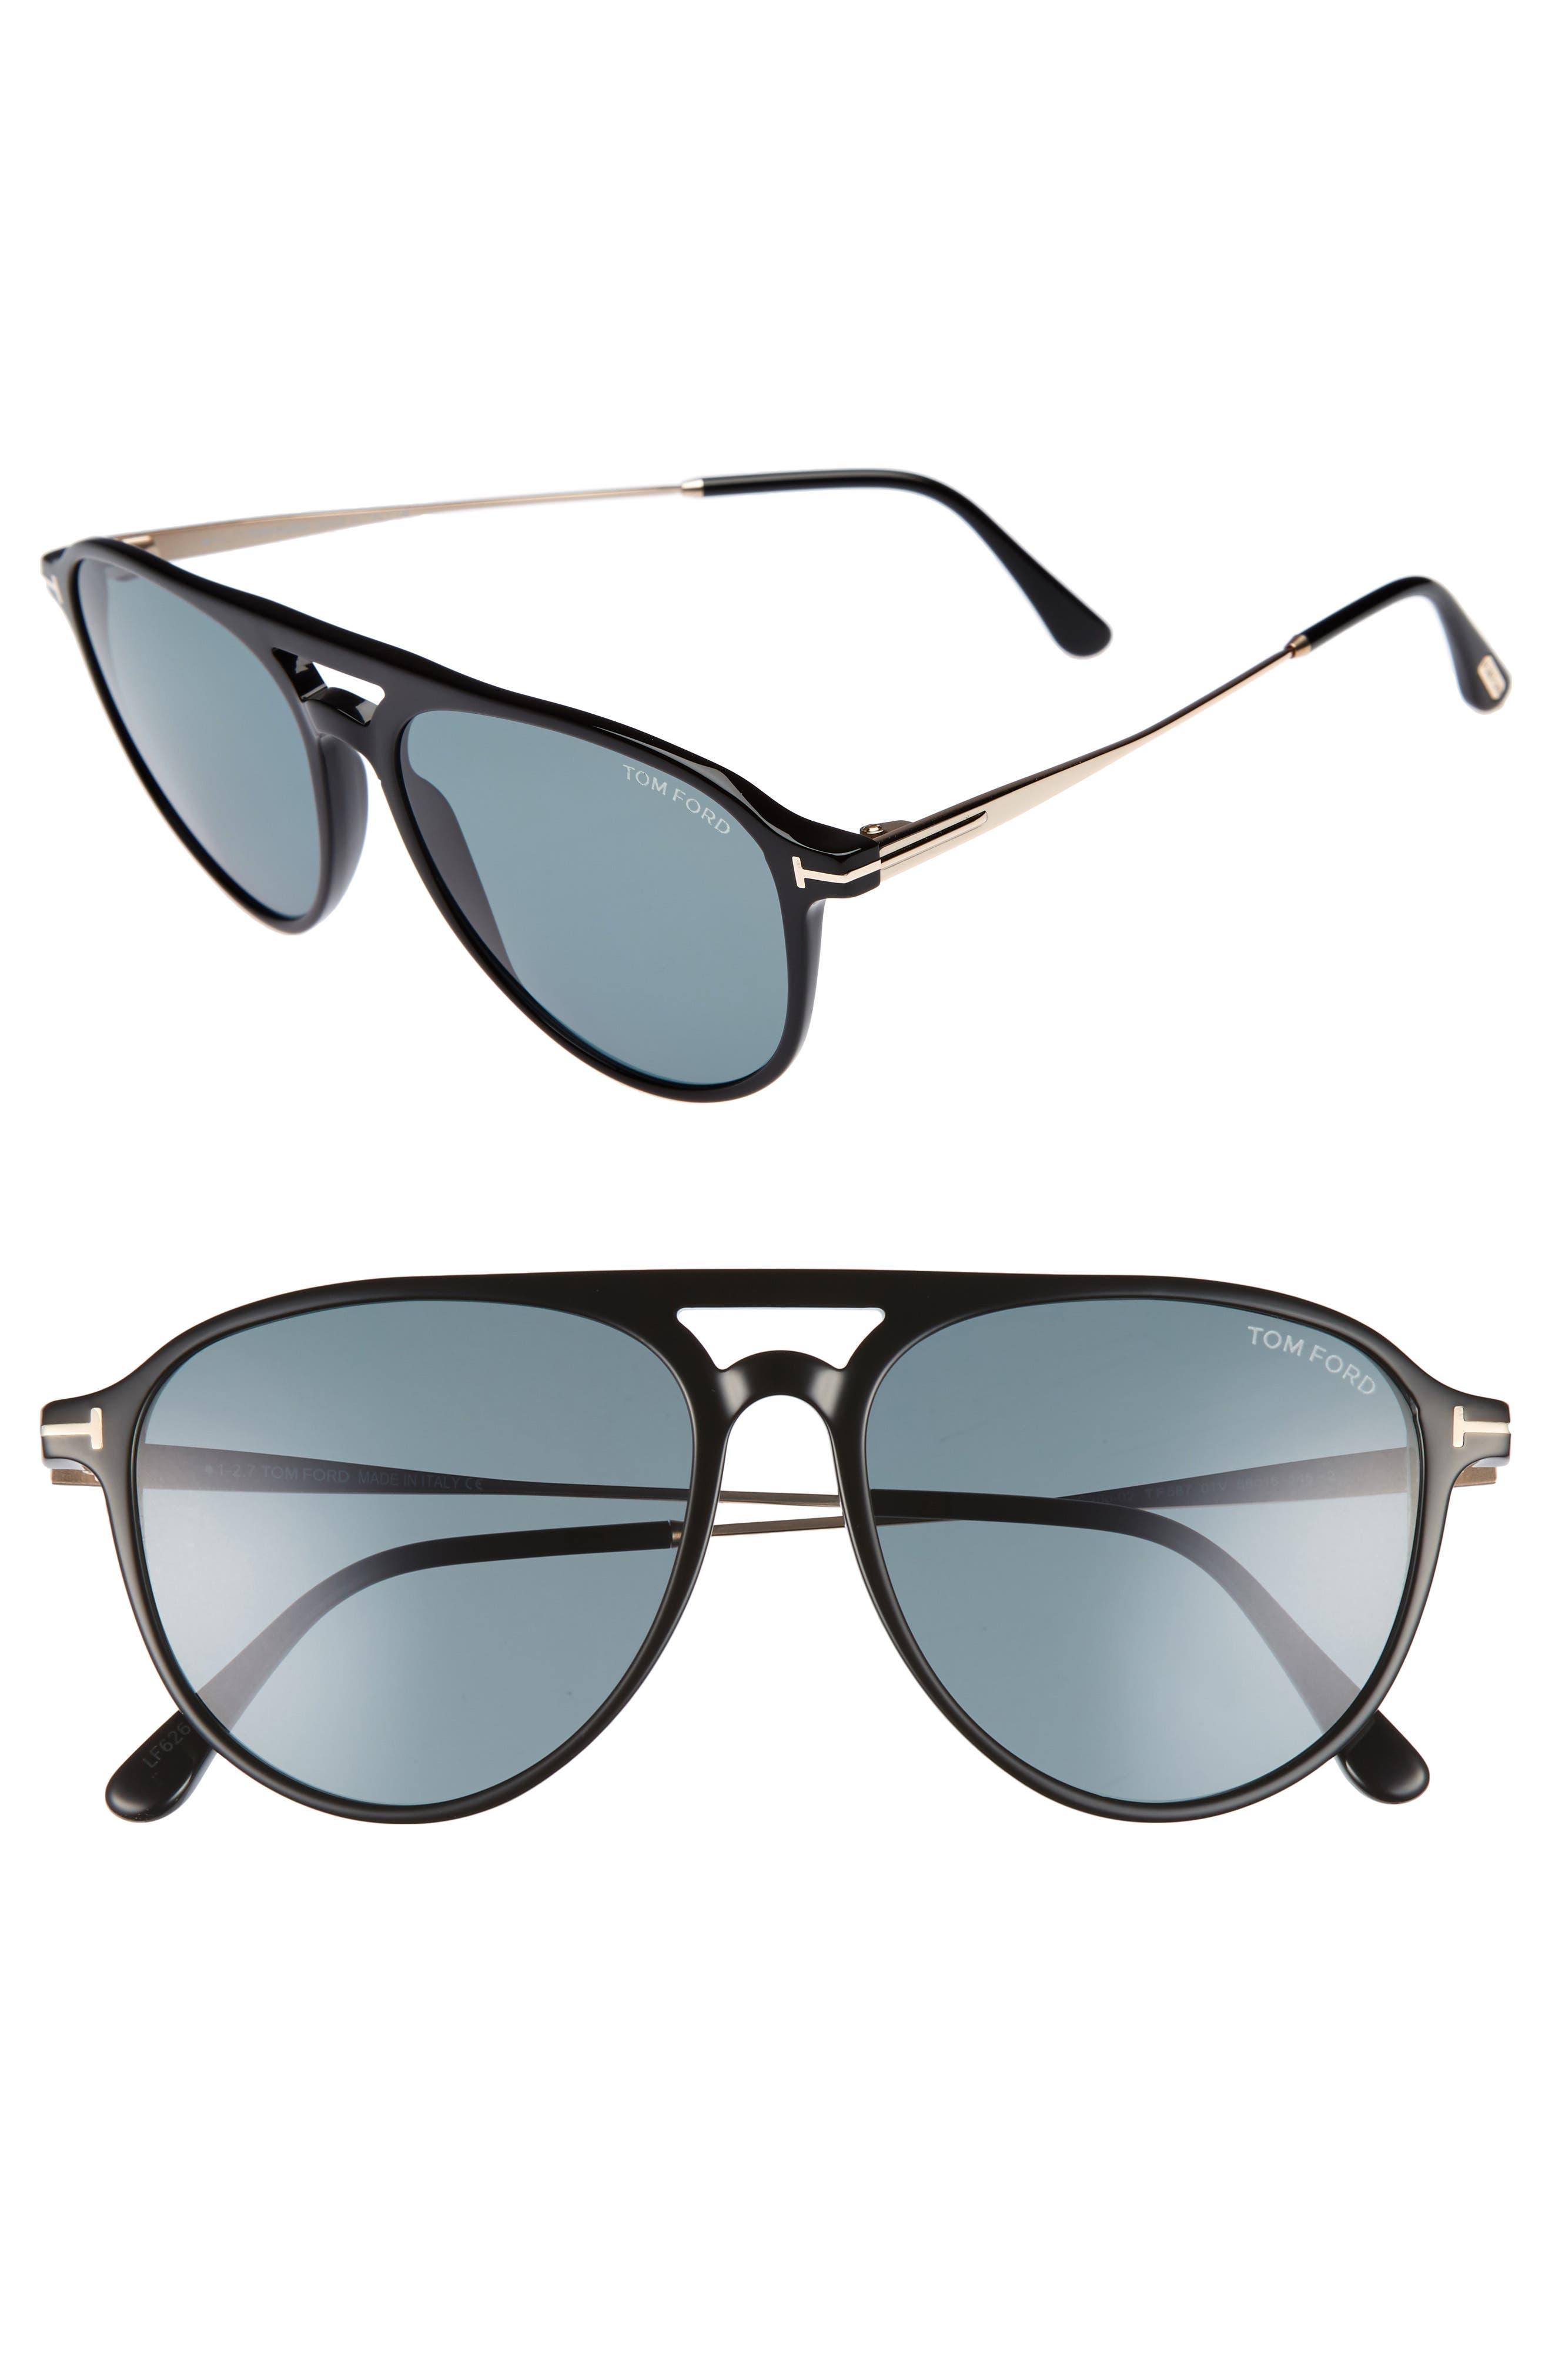 Carlo 59mm Aviator Sunglasses,                             Main thumbnail 1, color,                             001